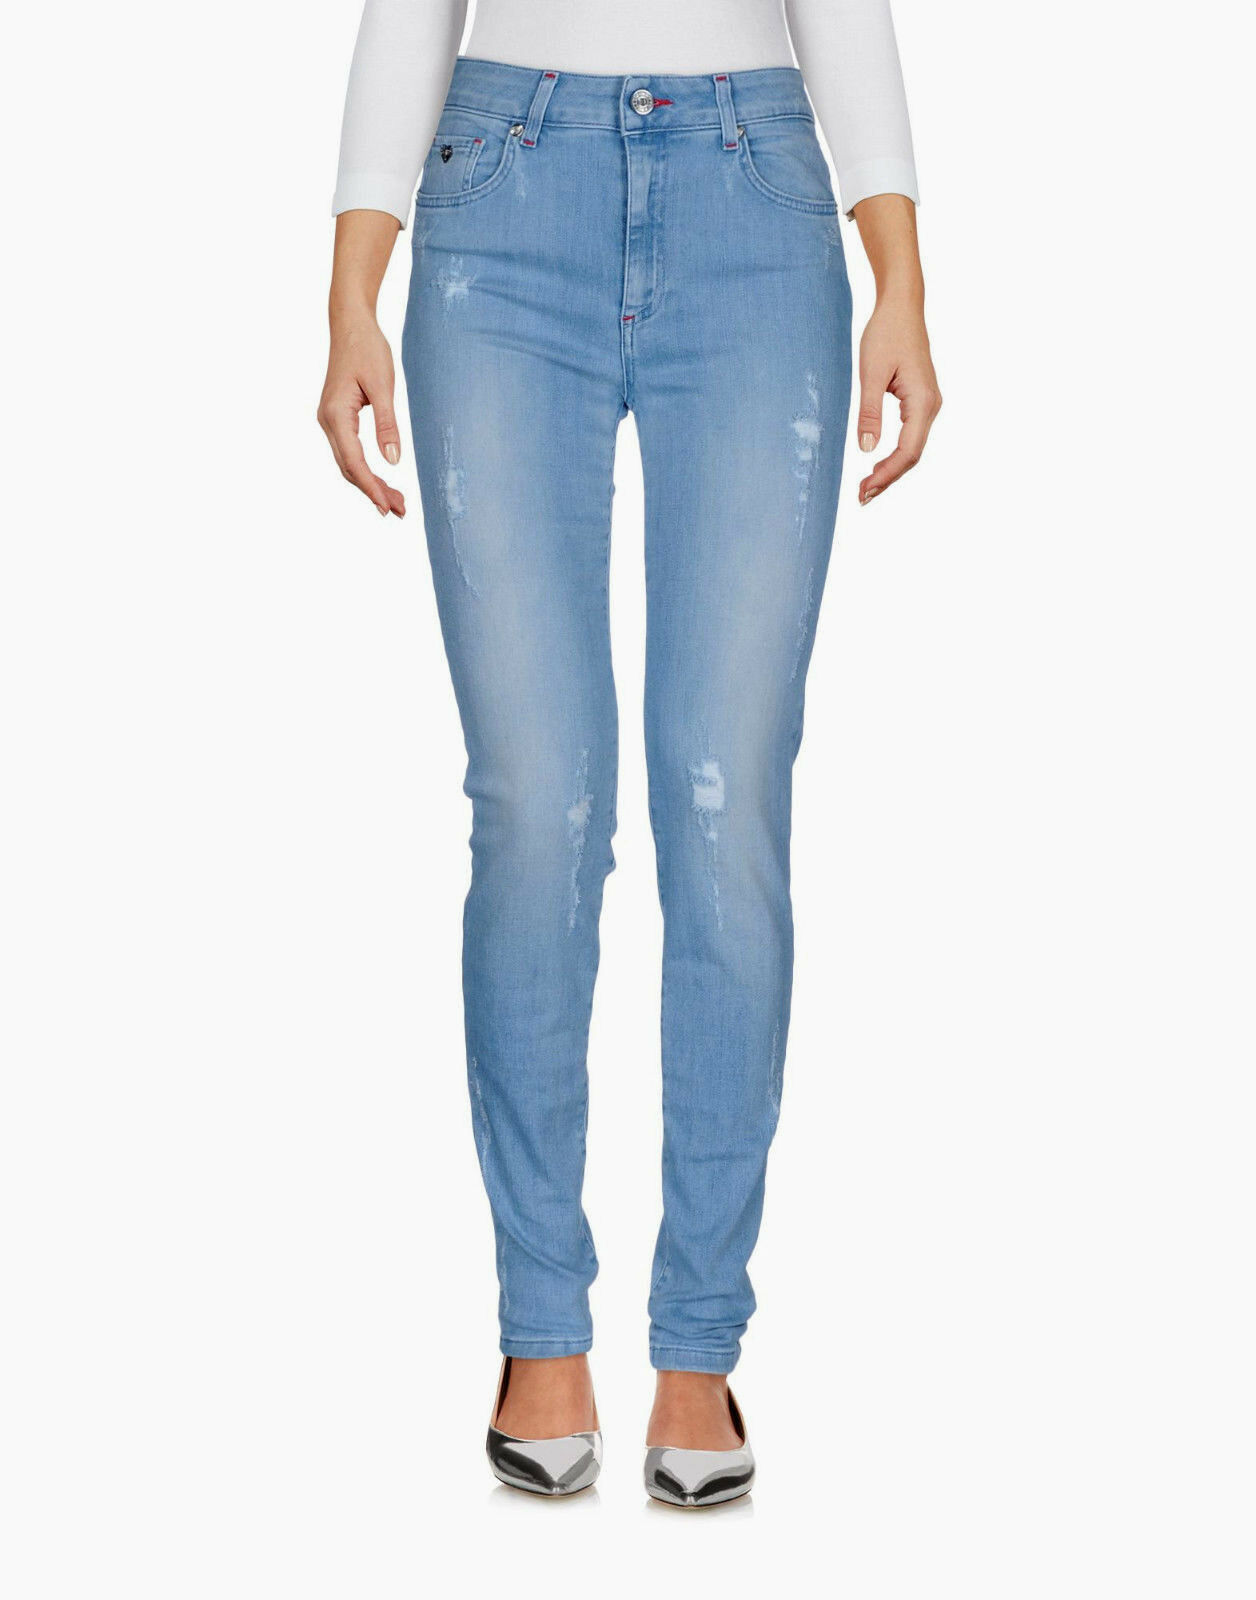 blueGIRL FOLIES High Waist Skinny Jeans NWT  159